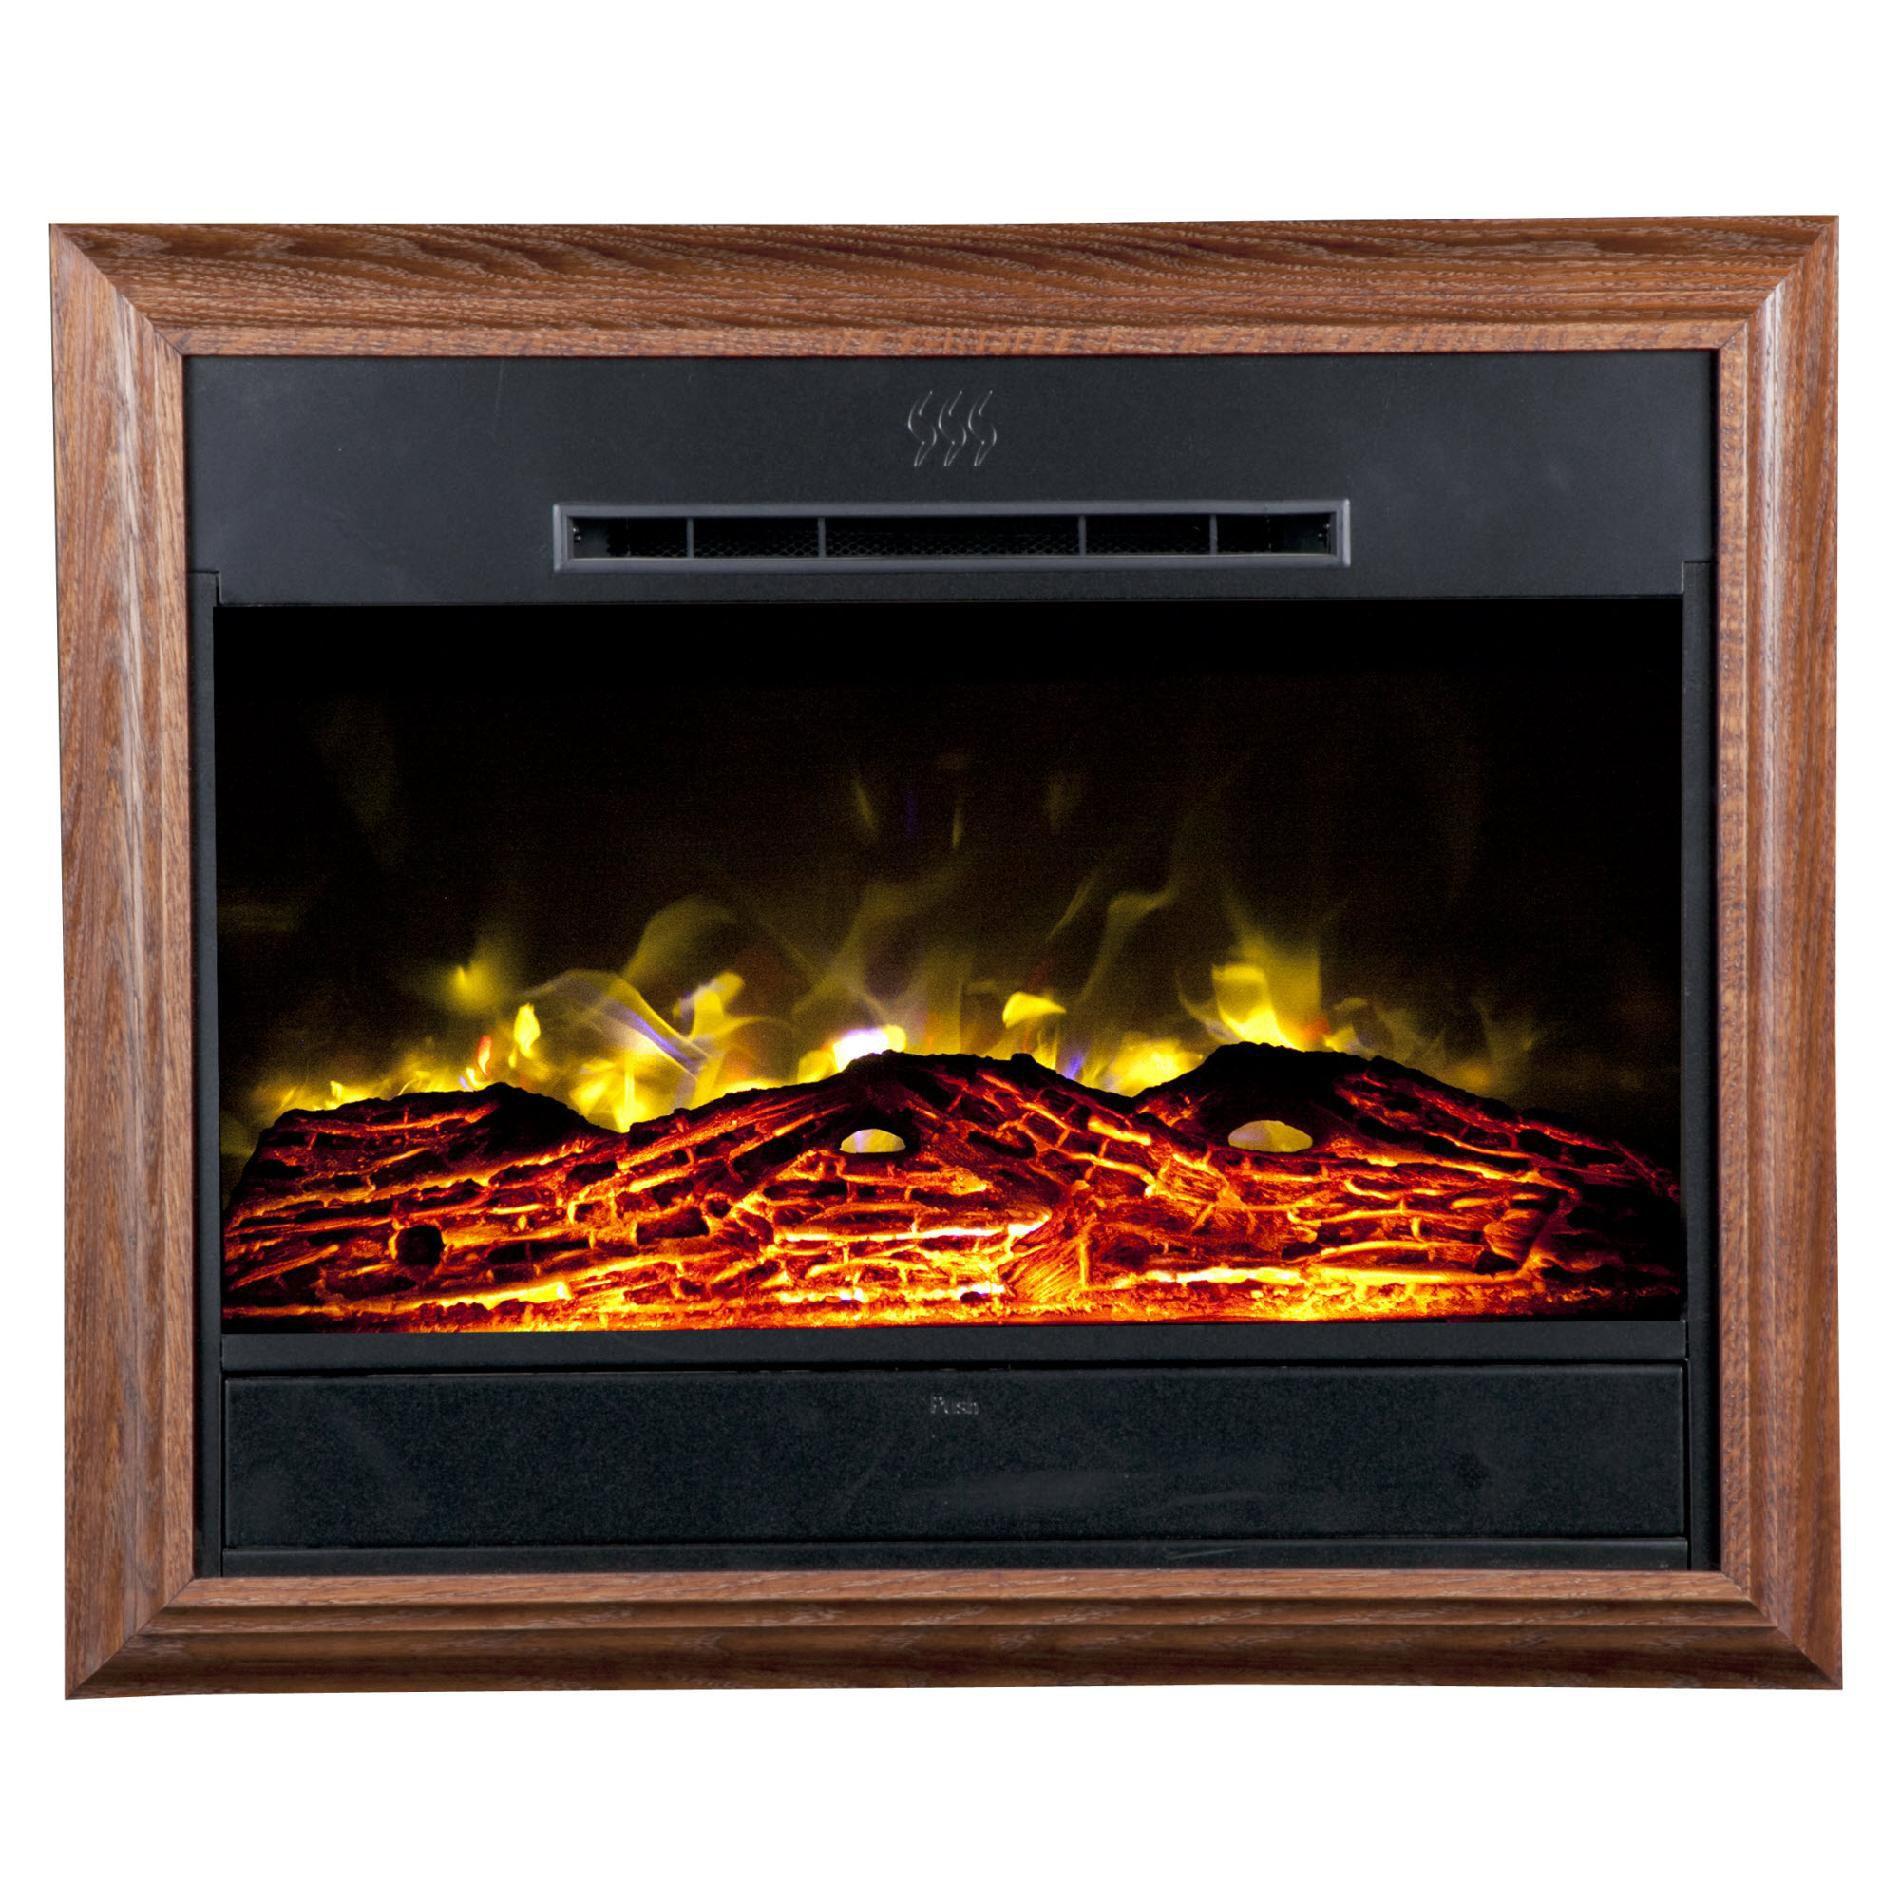 Heat Surge Roll N Glow Electric Fireplace